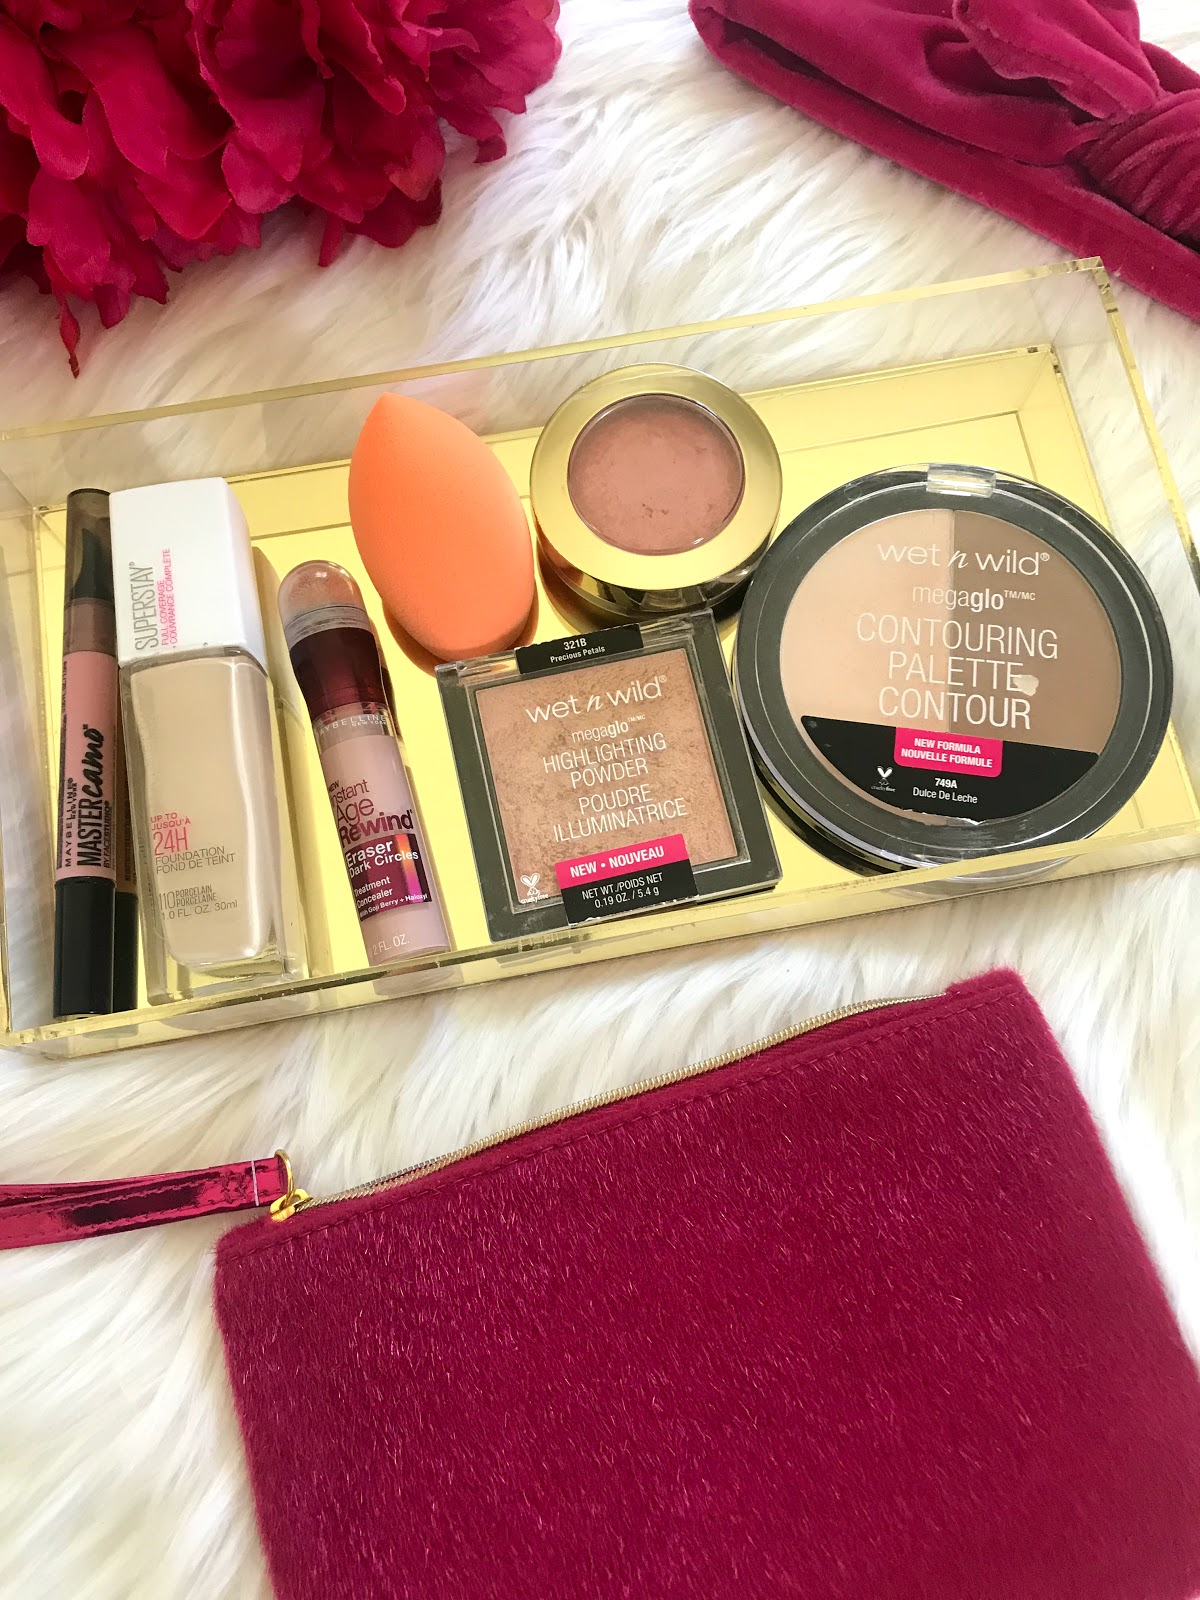 favorite drugstore foundation, powder, contour, blush, and concealor